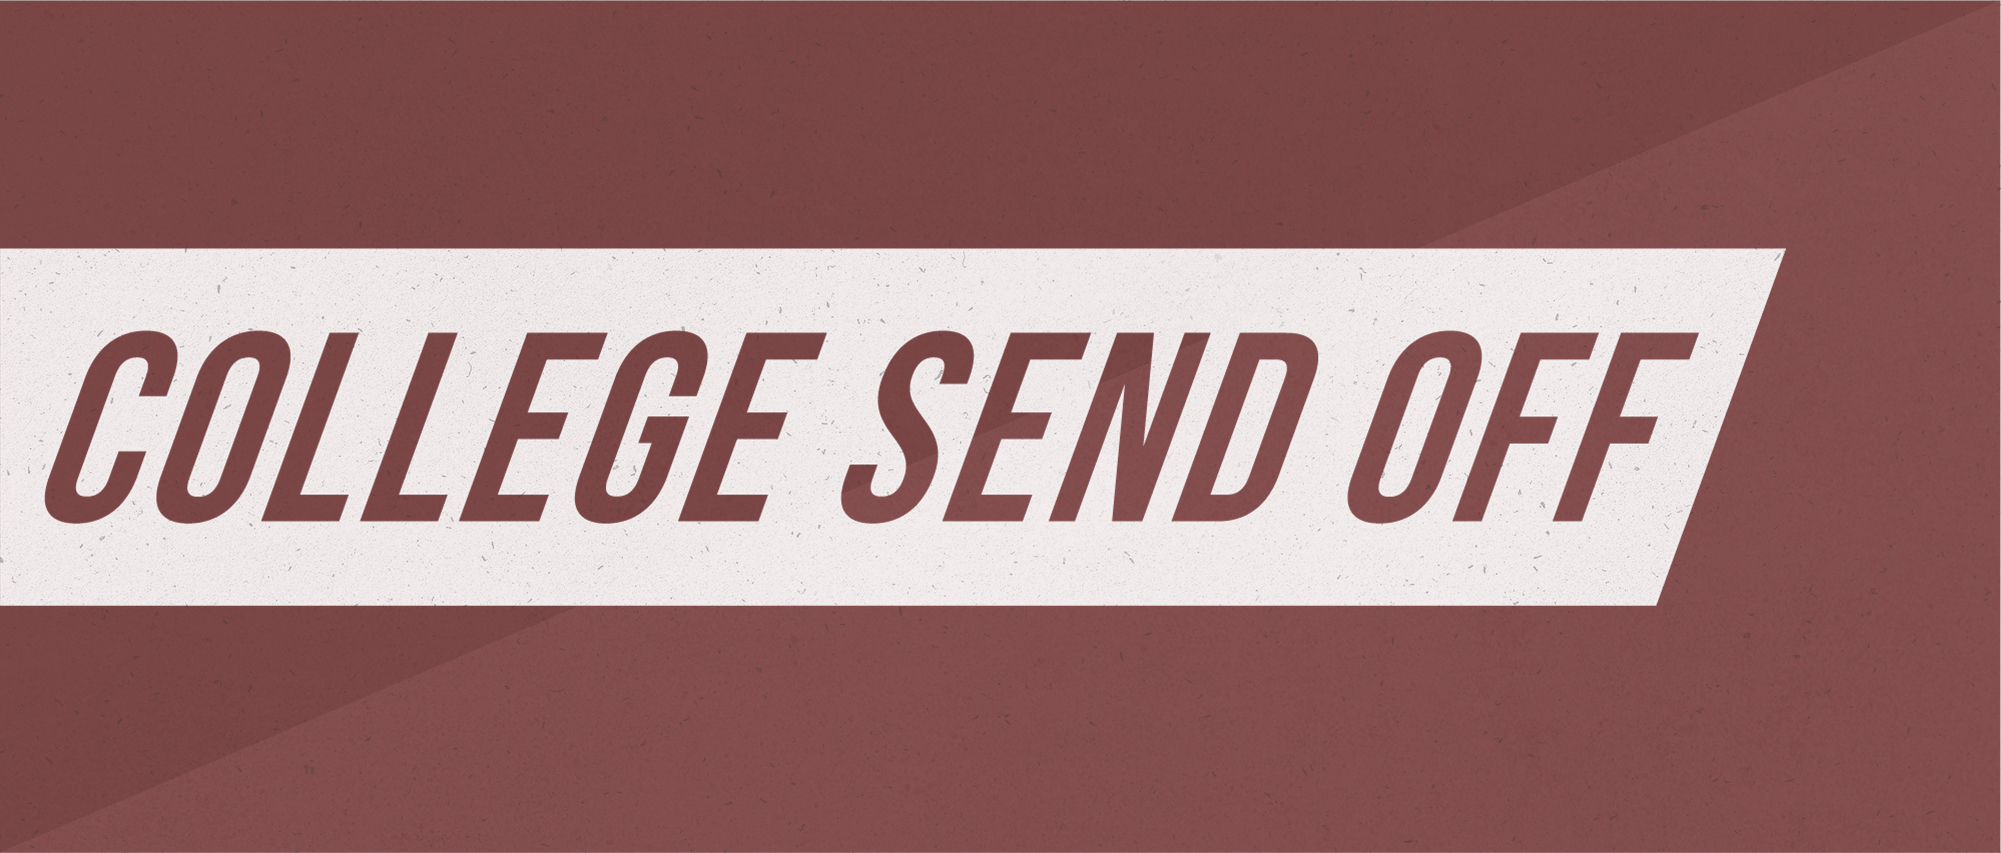 CollegeSendOff_Web.jpg